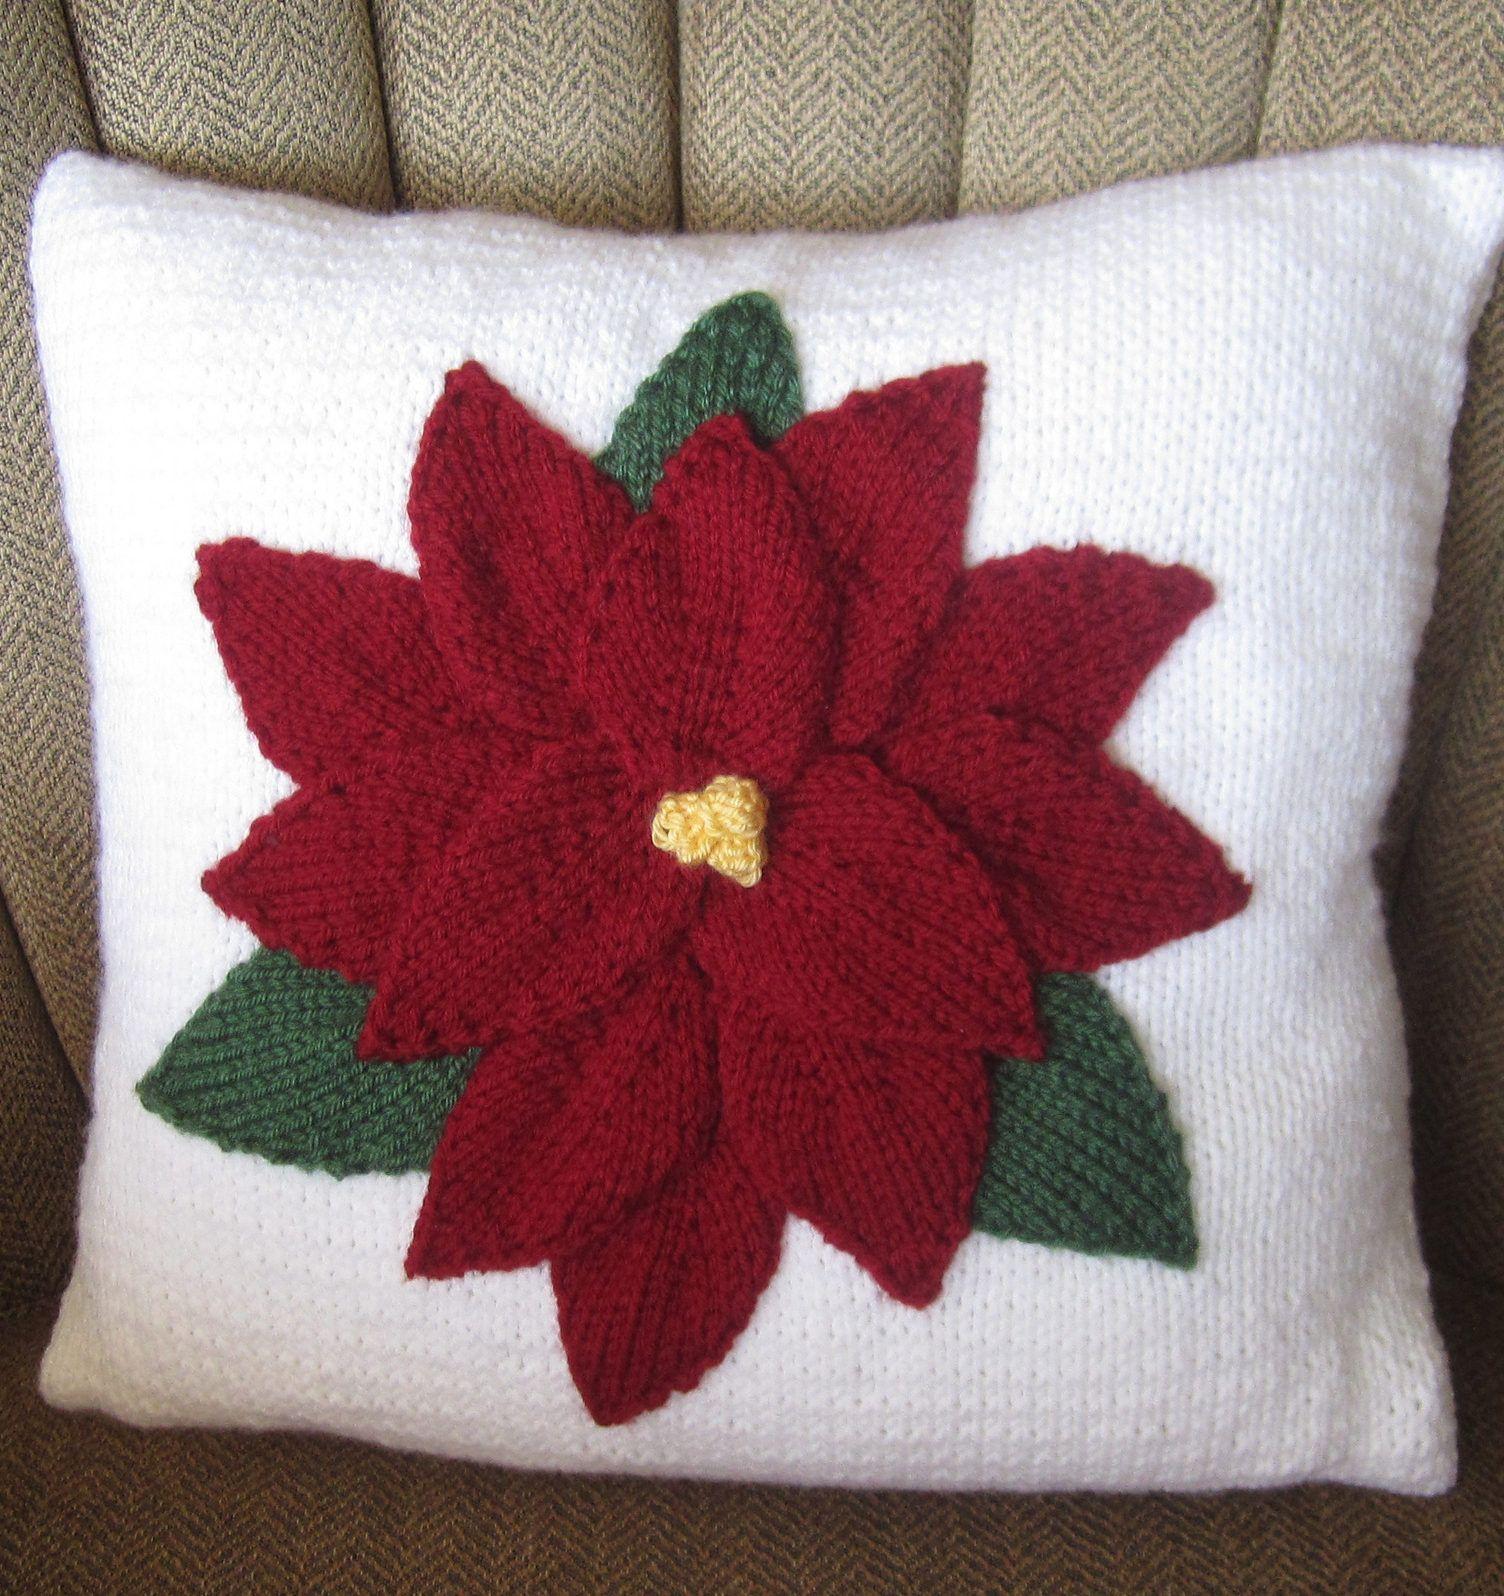 Knitting pattern for poinsettia pillow uxu poinsettia pillow